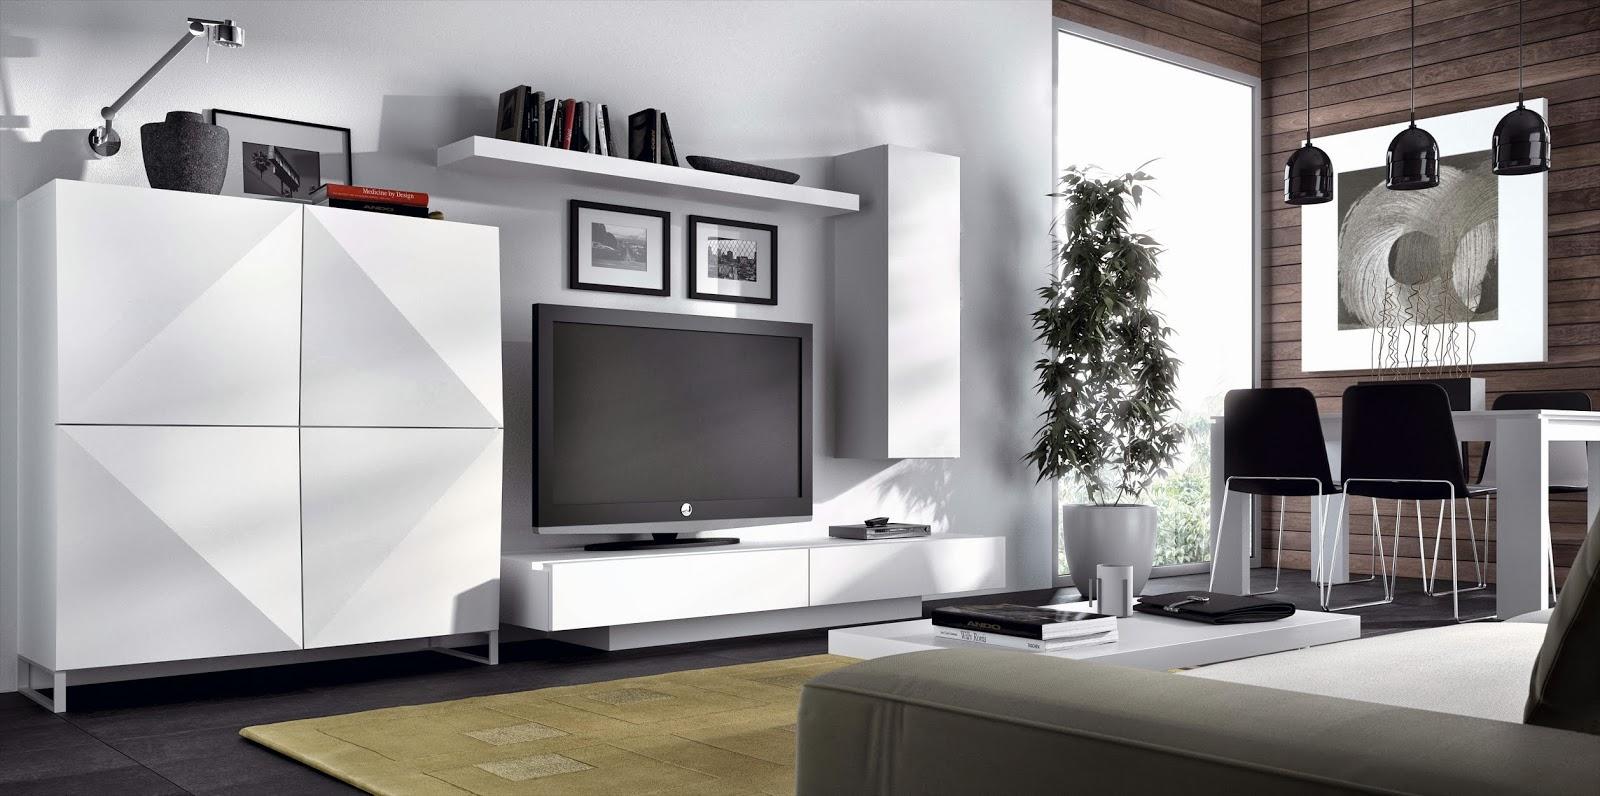 Informaci n de mobiliario opini n de producto colecci n for Fabrica muebles modernos